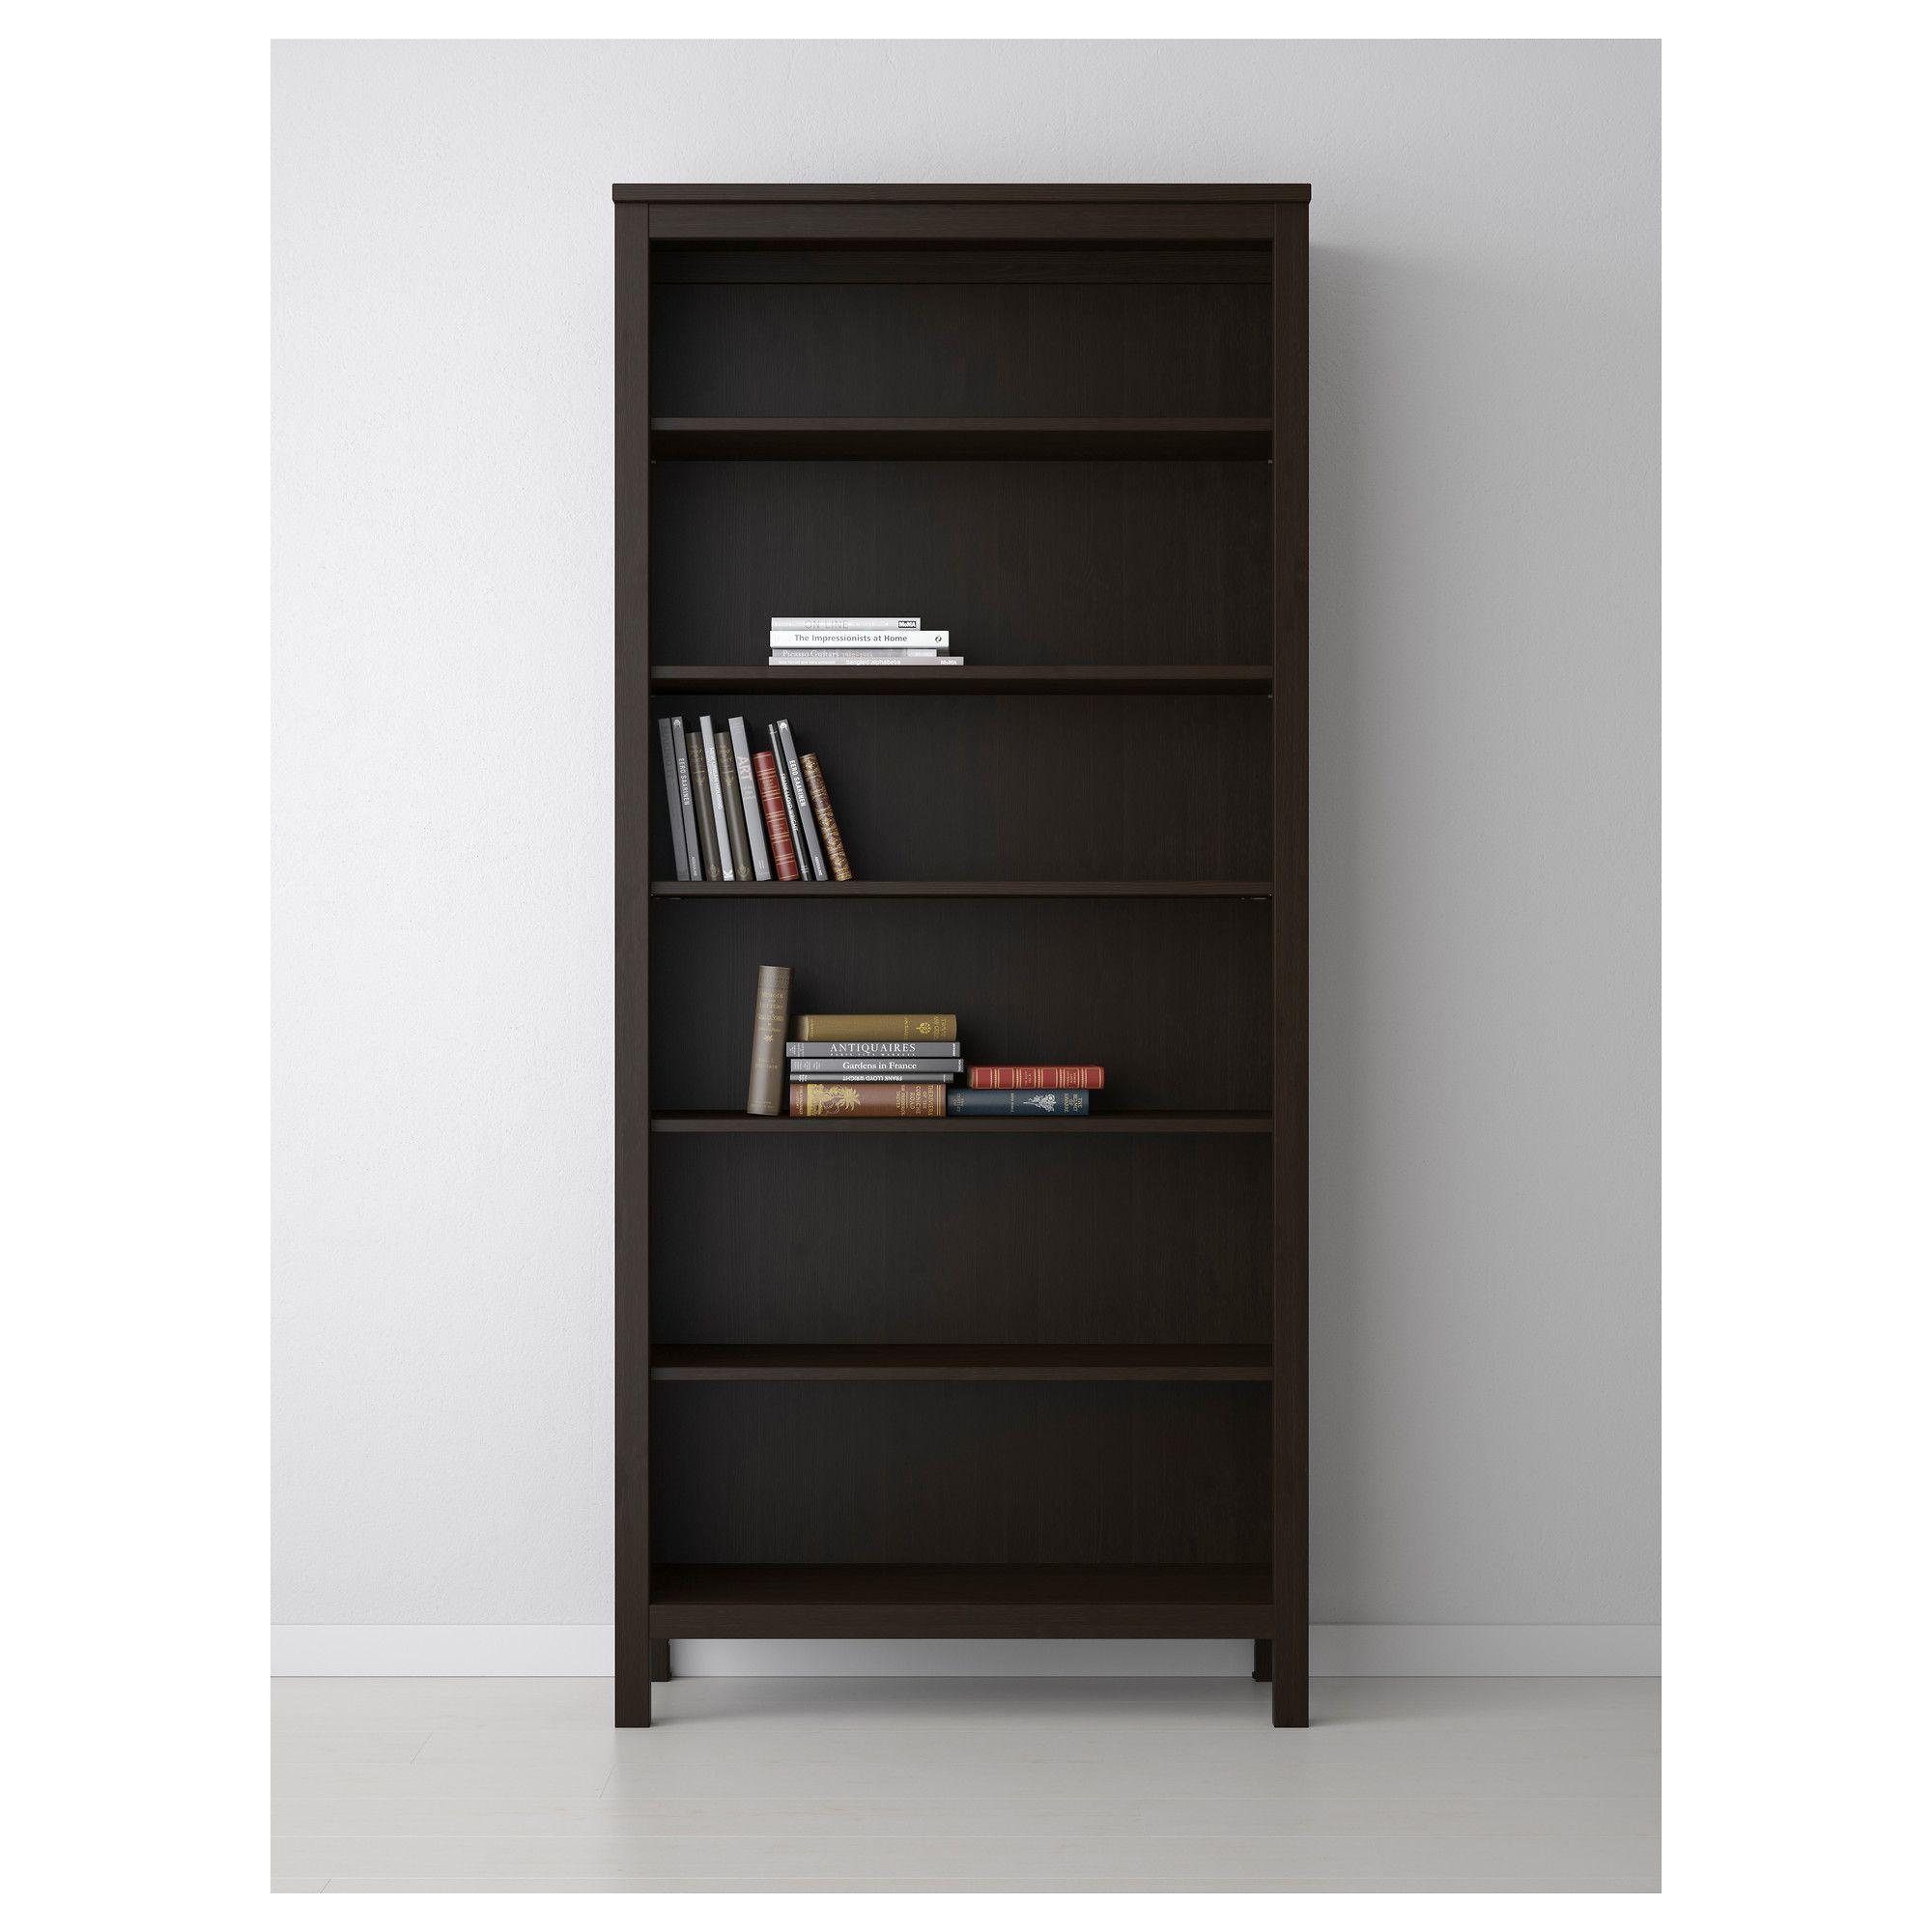 HEMNES βιβΠιοθΠκη IKEA το σπιτάκι μας Pinterest